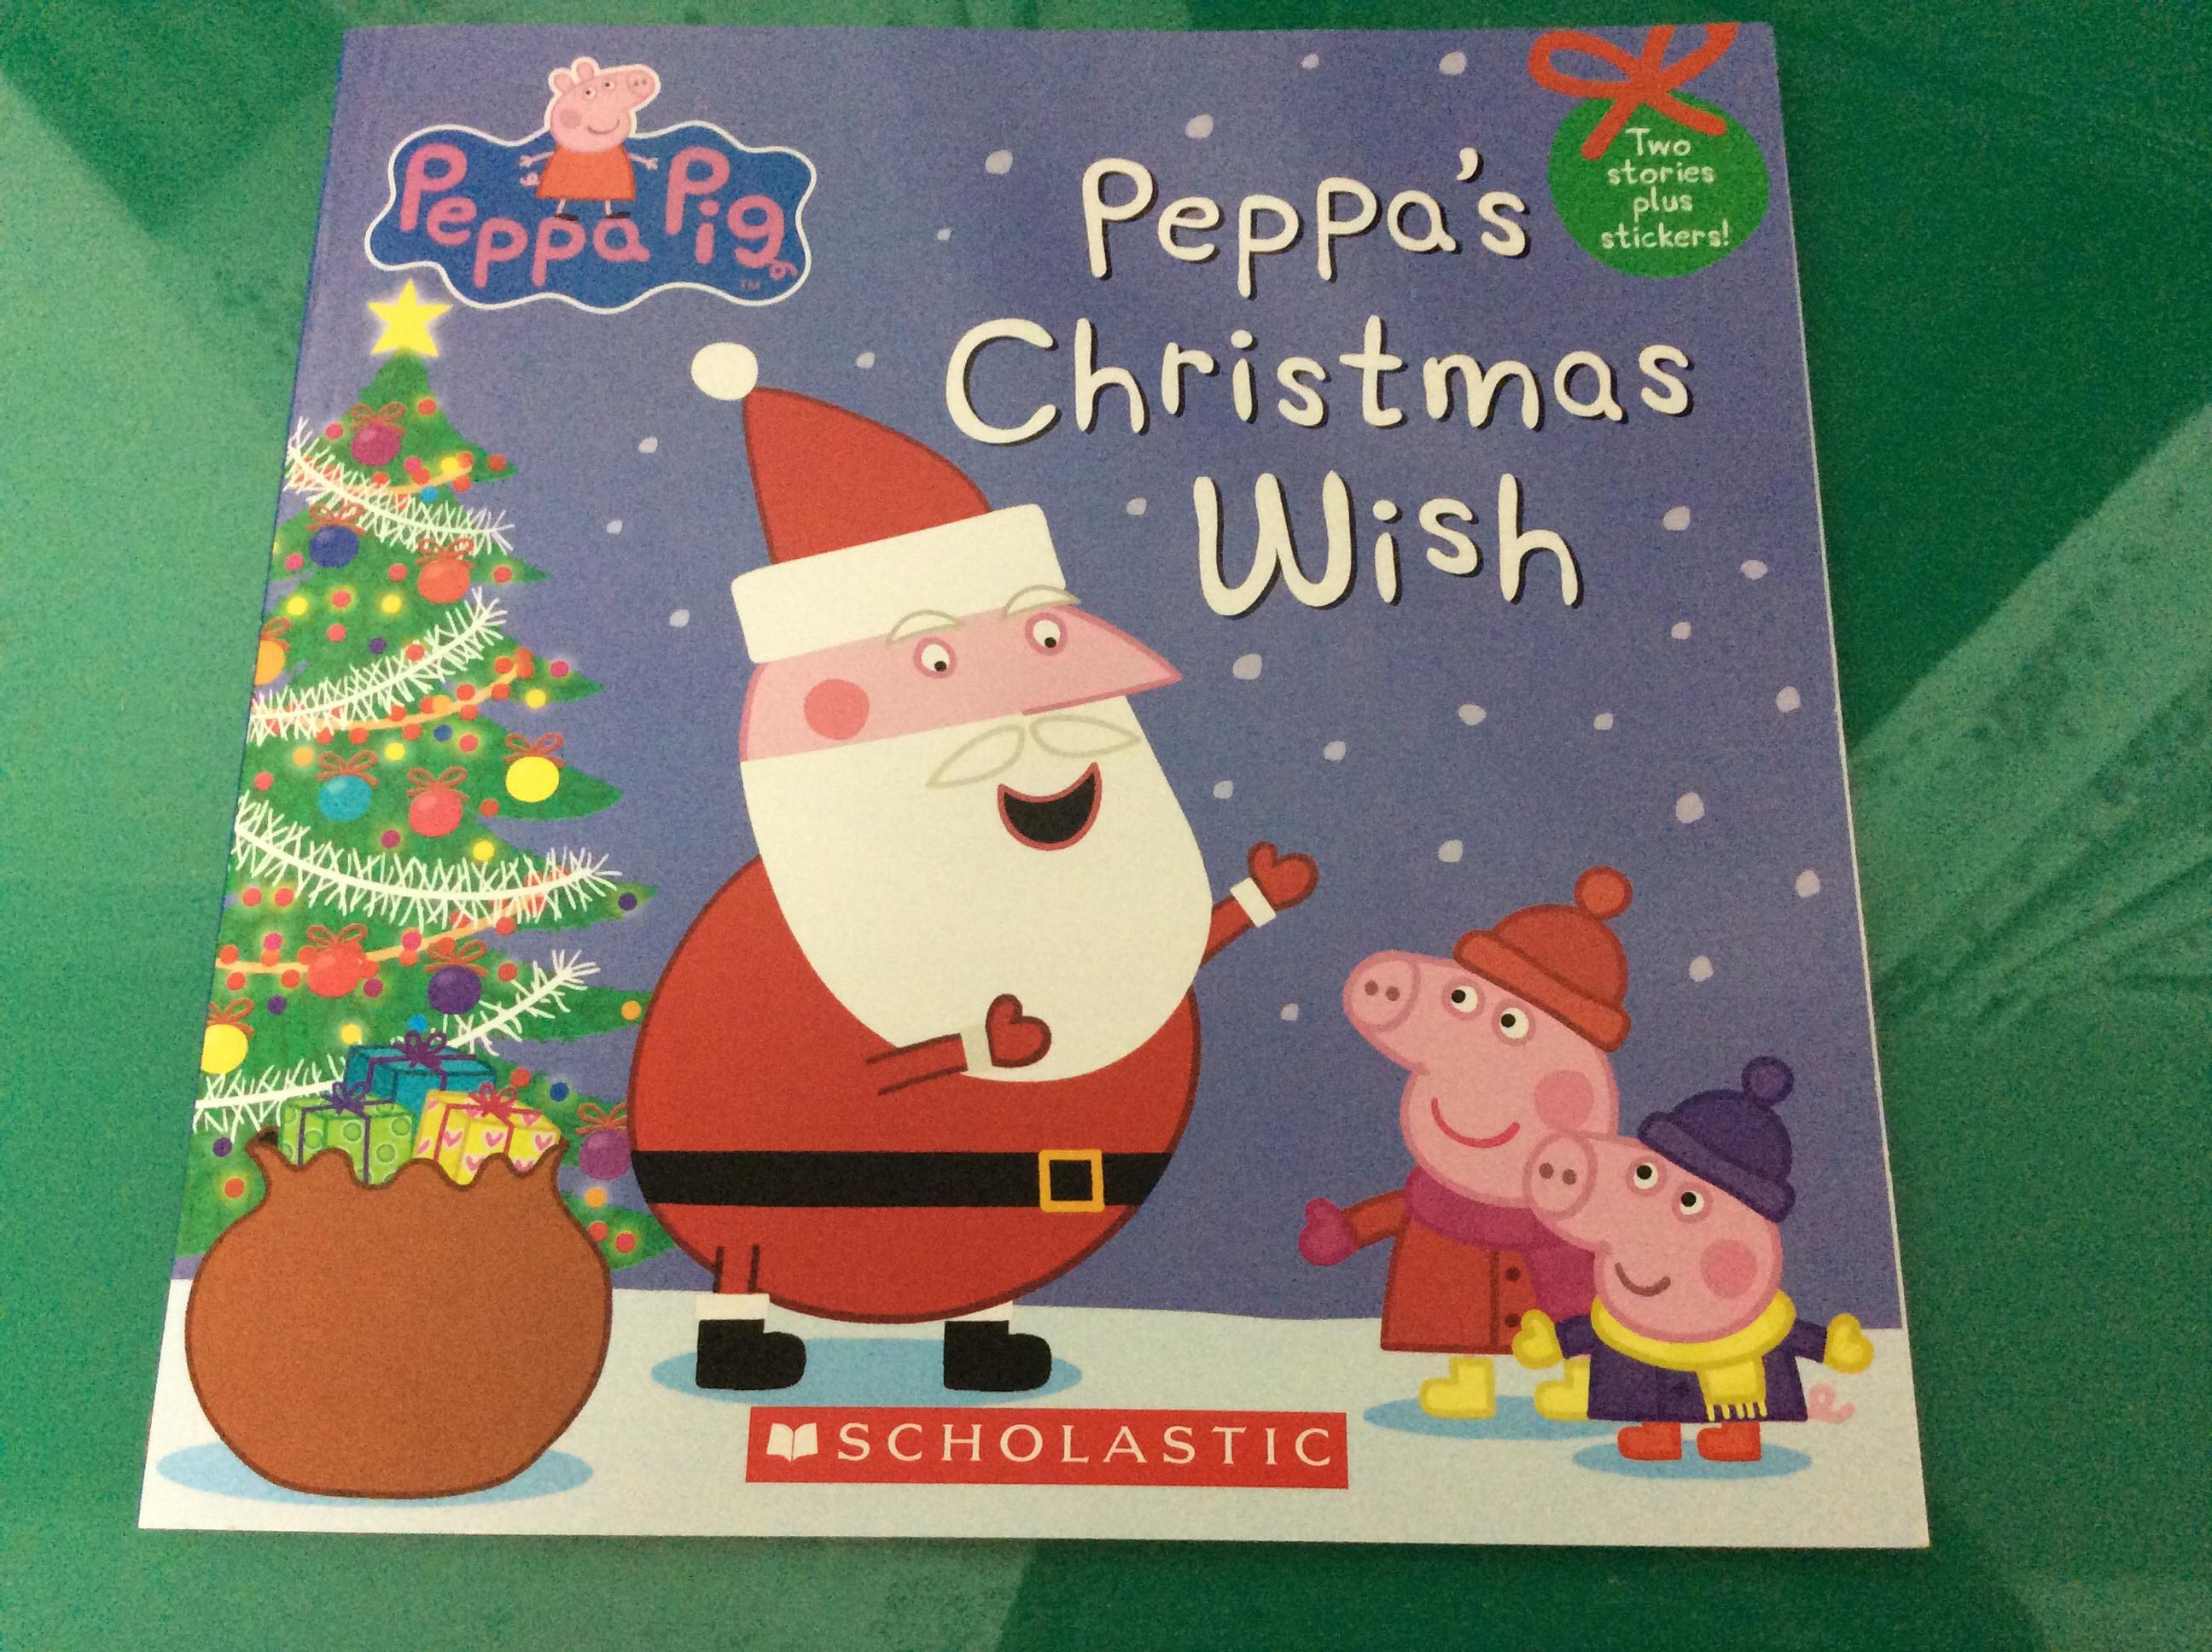 Peppa's Christmas Wish